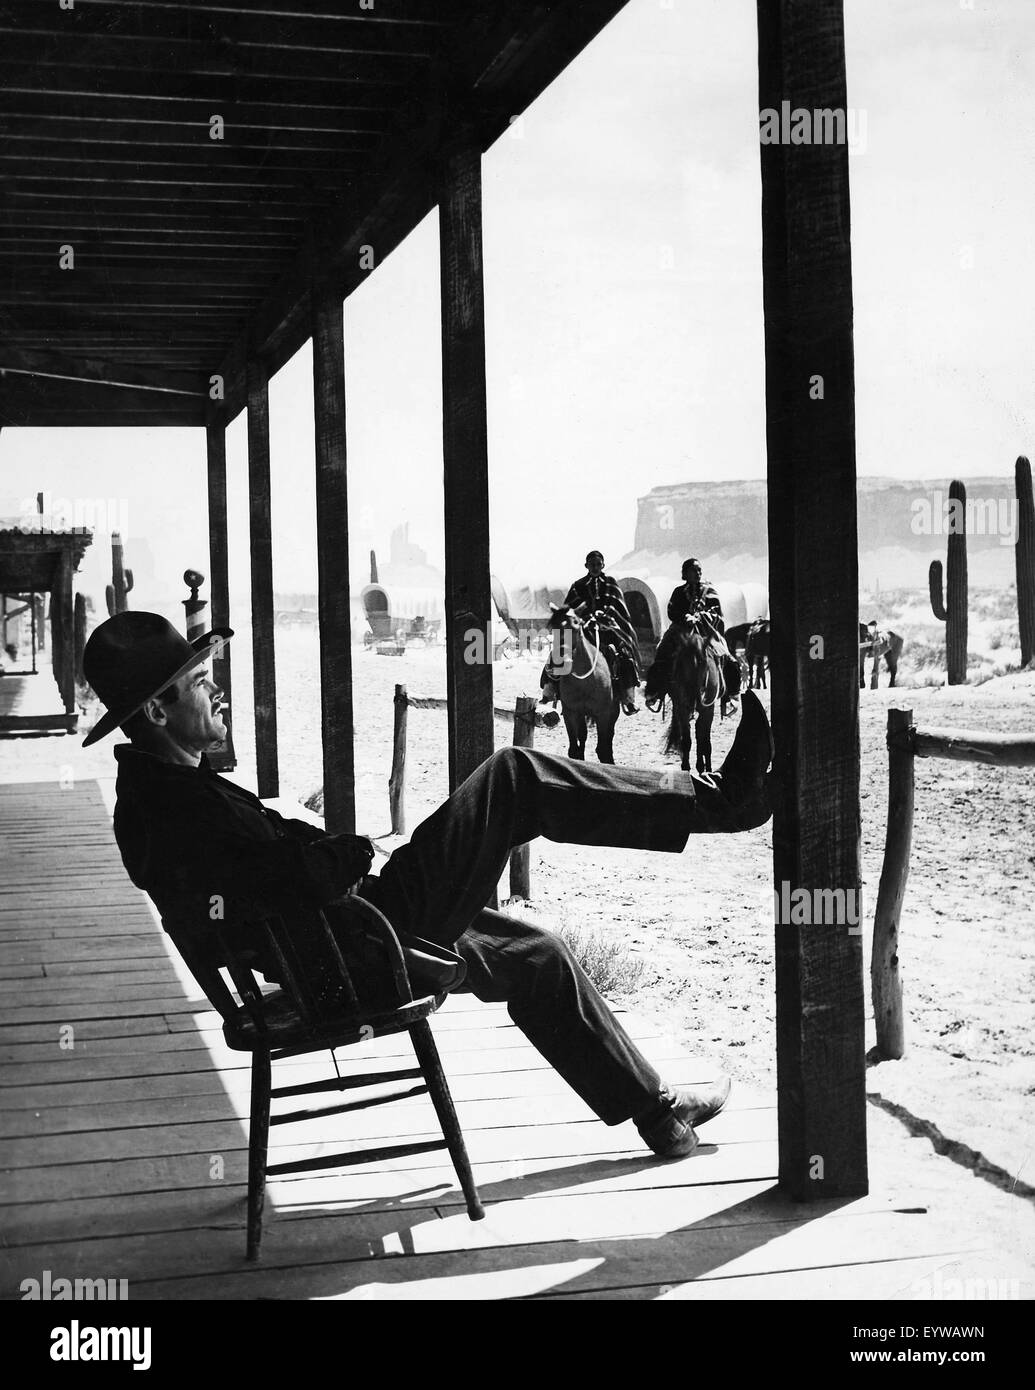 My Darling Clementine ; Year : 1946 USA ; Director : John Ford ; Henry Fonda - Stock Image